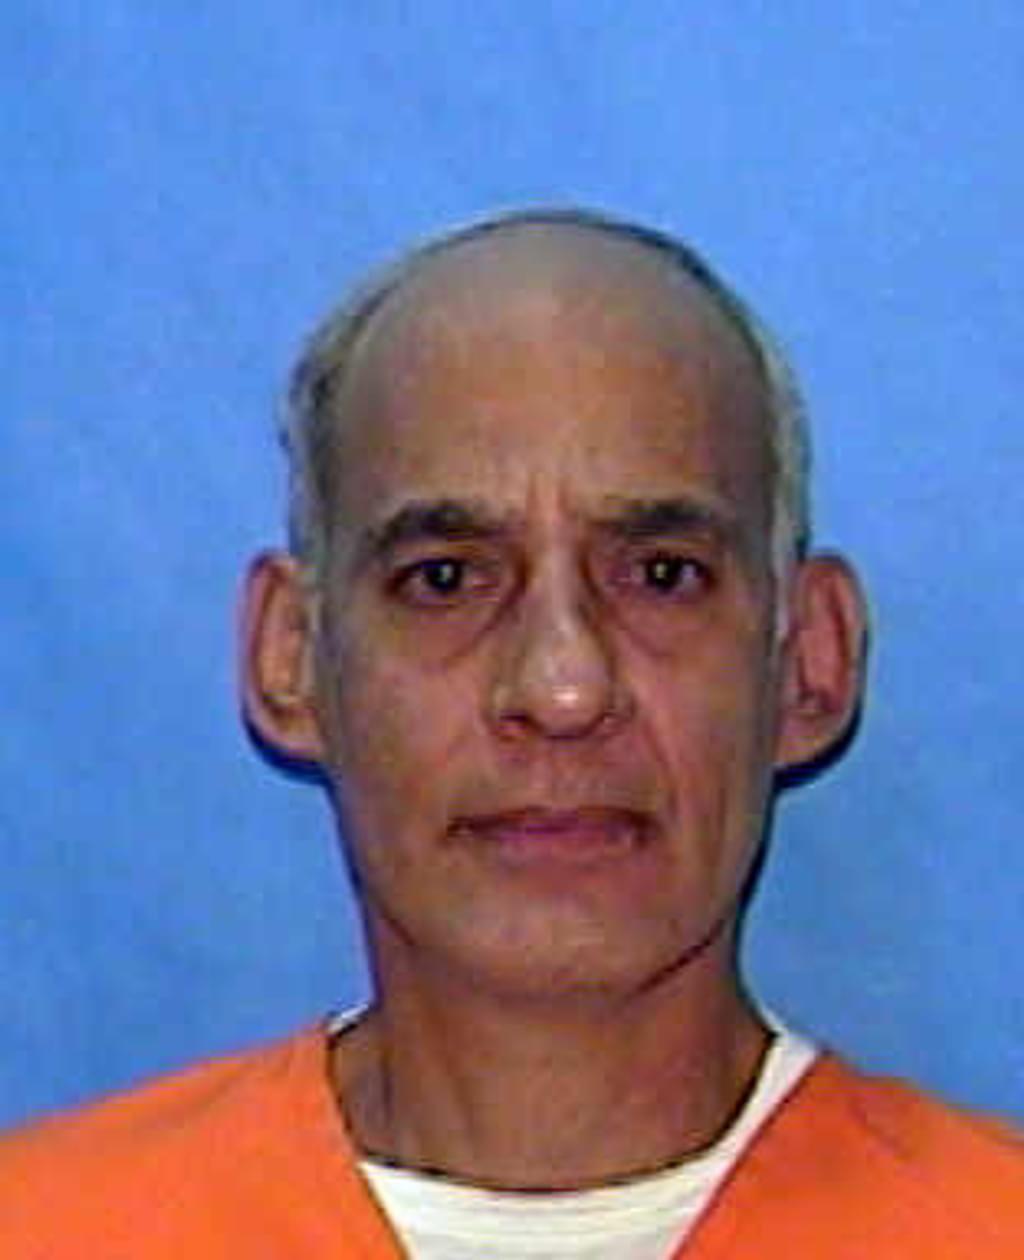 UPCOMING EXECUTION: Florida Case Raises Numerous Legal Concerns